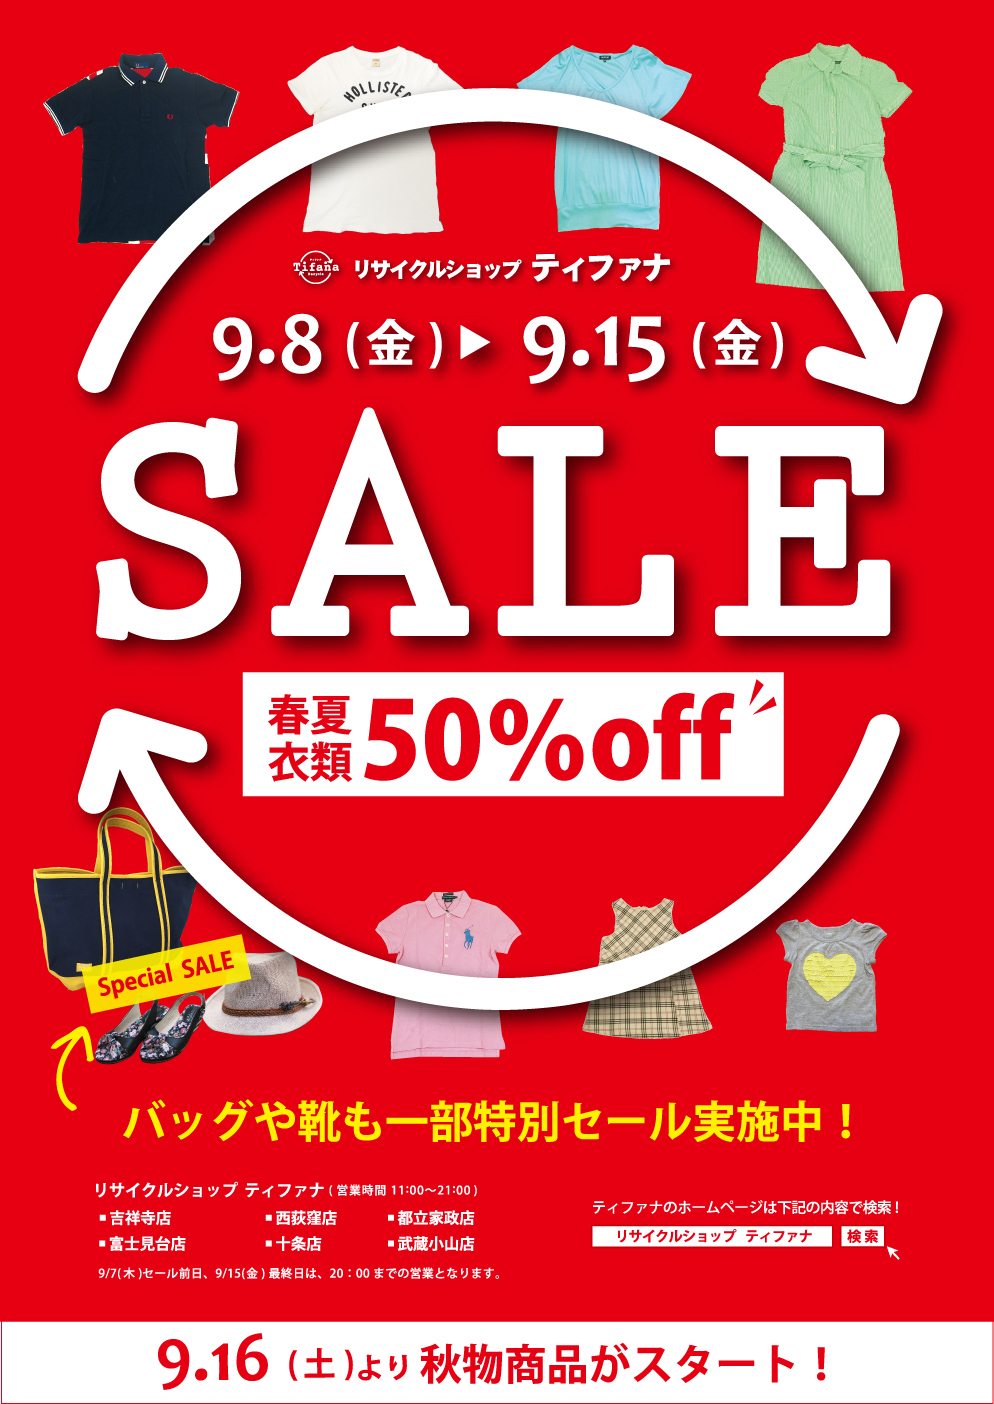 春夏衣類一掃!半額セール2017開催!!